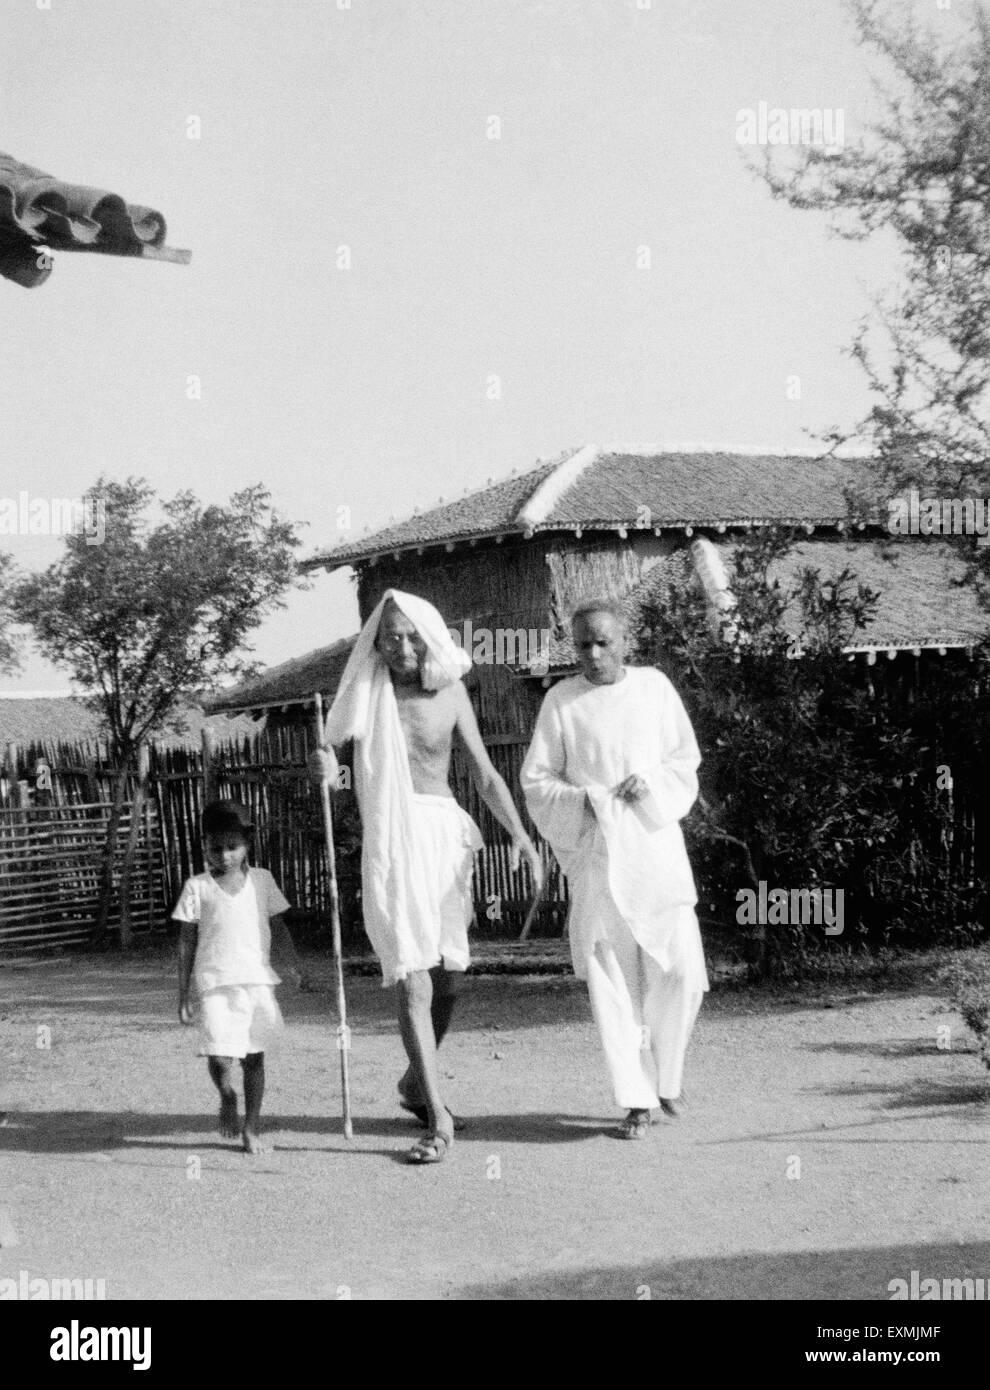 Mahatma Gandhi walking with Dr. Das and a boy at Sevagram Ashram ; 1940 NO MR - Stock Image